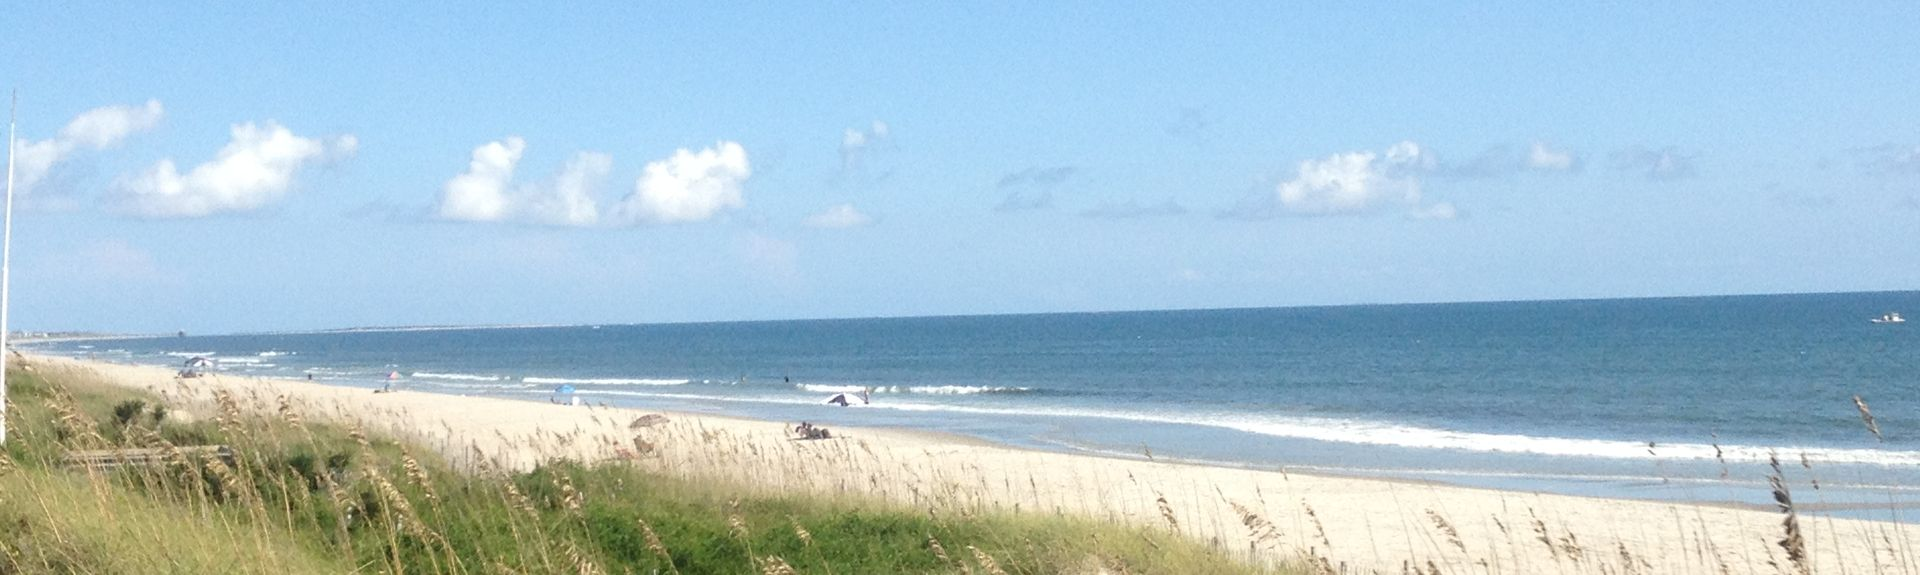 Ocean Sands, Atlantic Beach, NC, USA